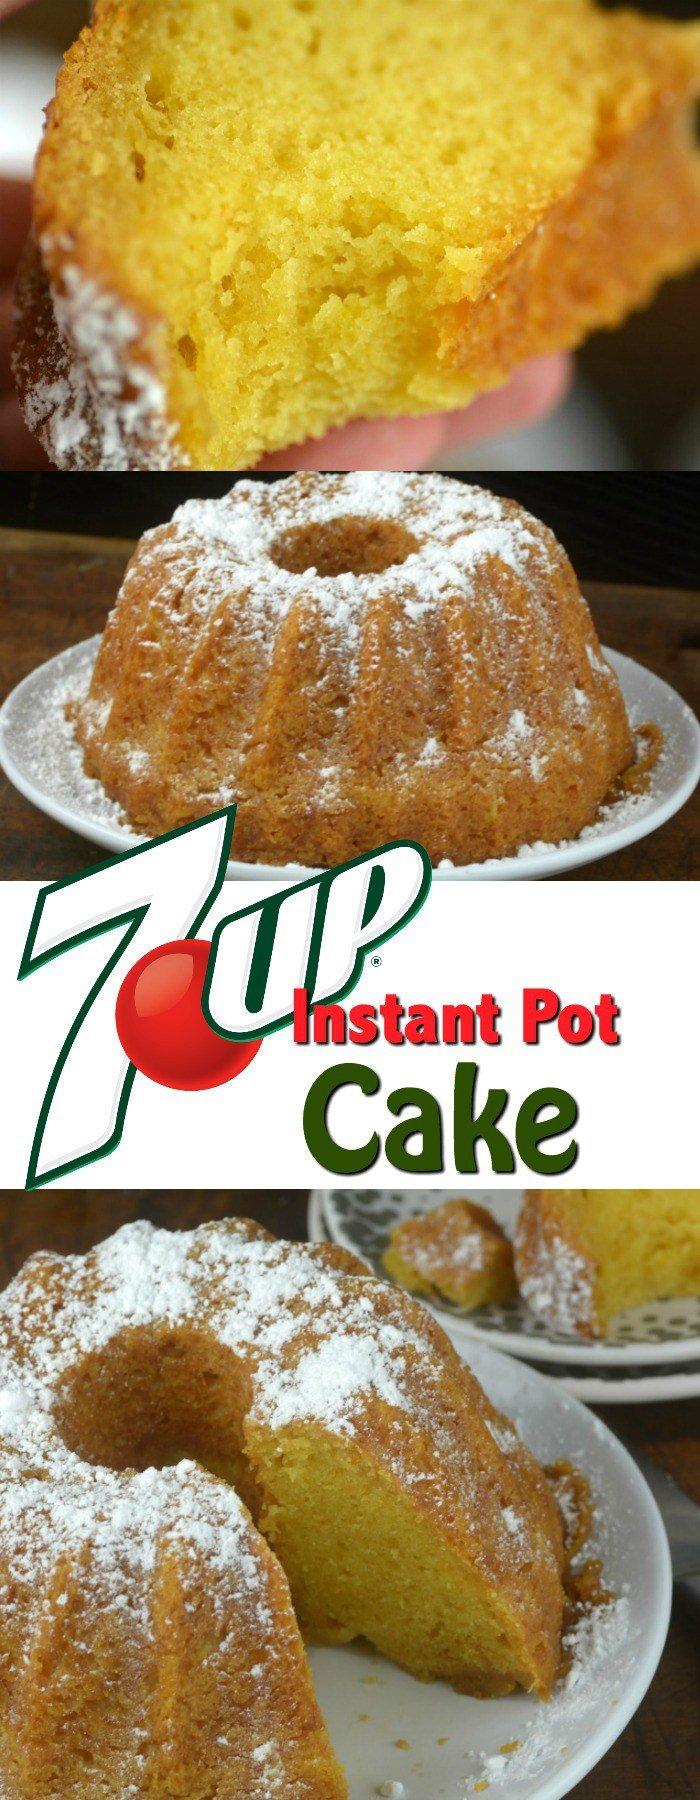 7 Up Instant Pot Bundt Cake Best Recipe Quick